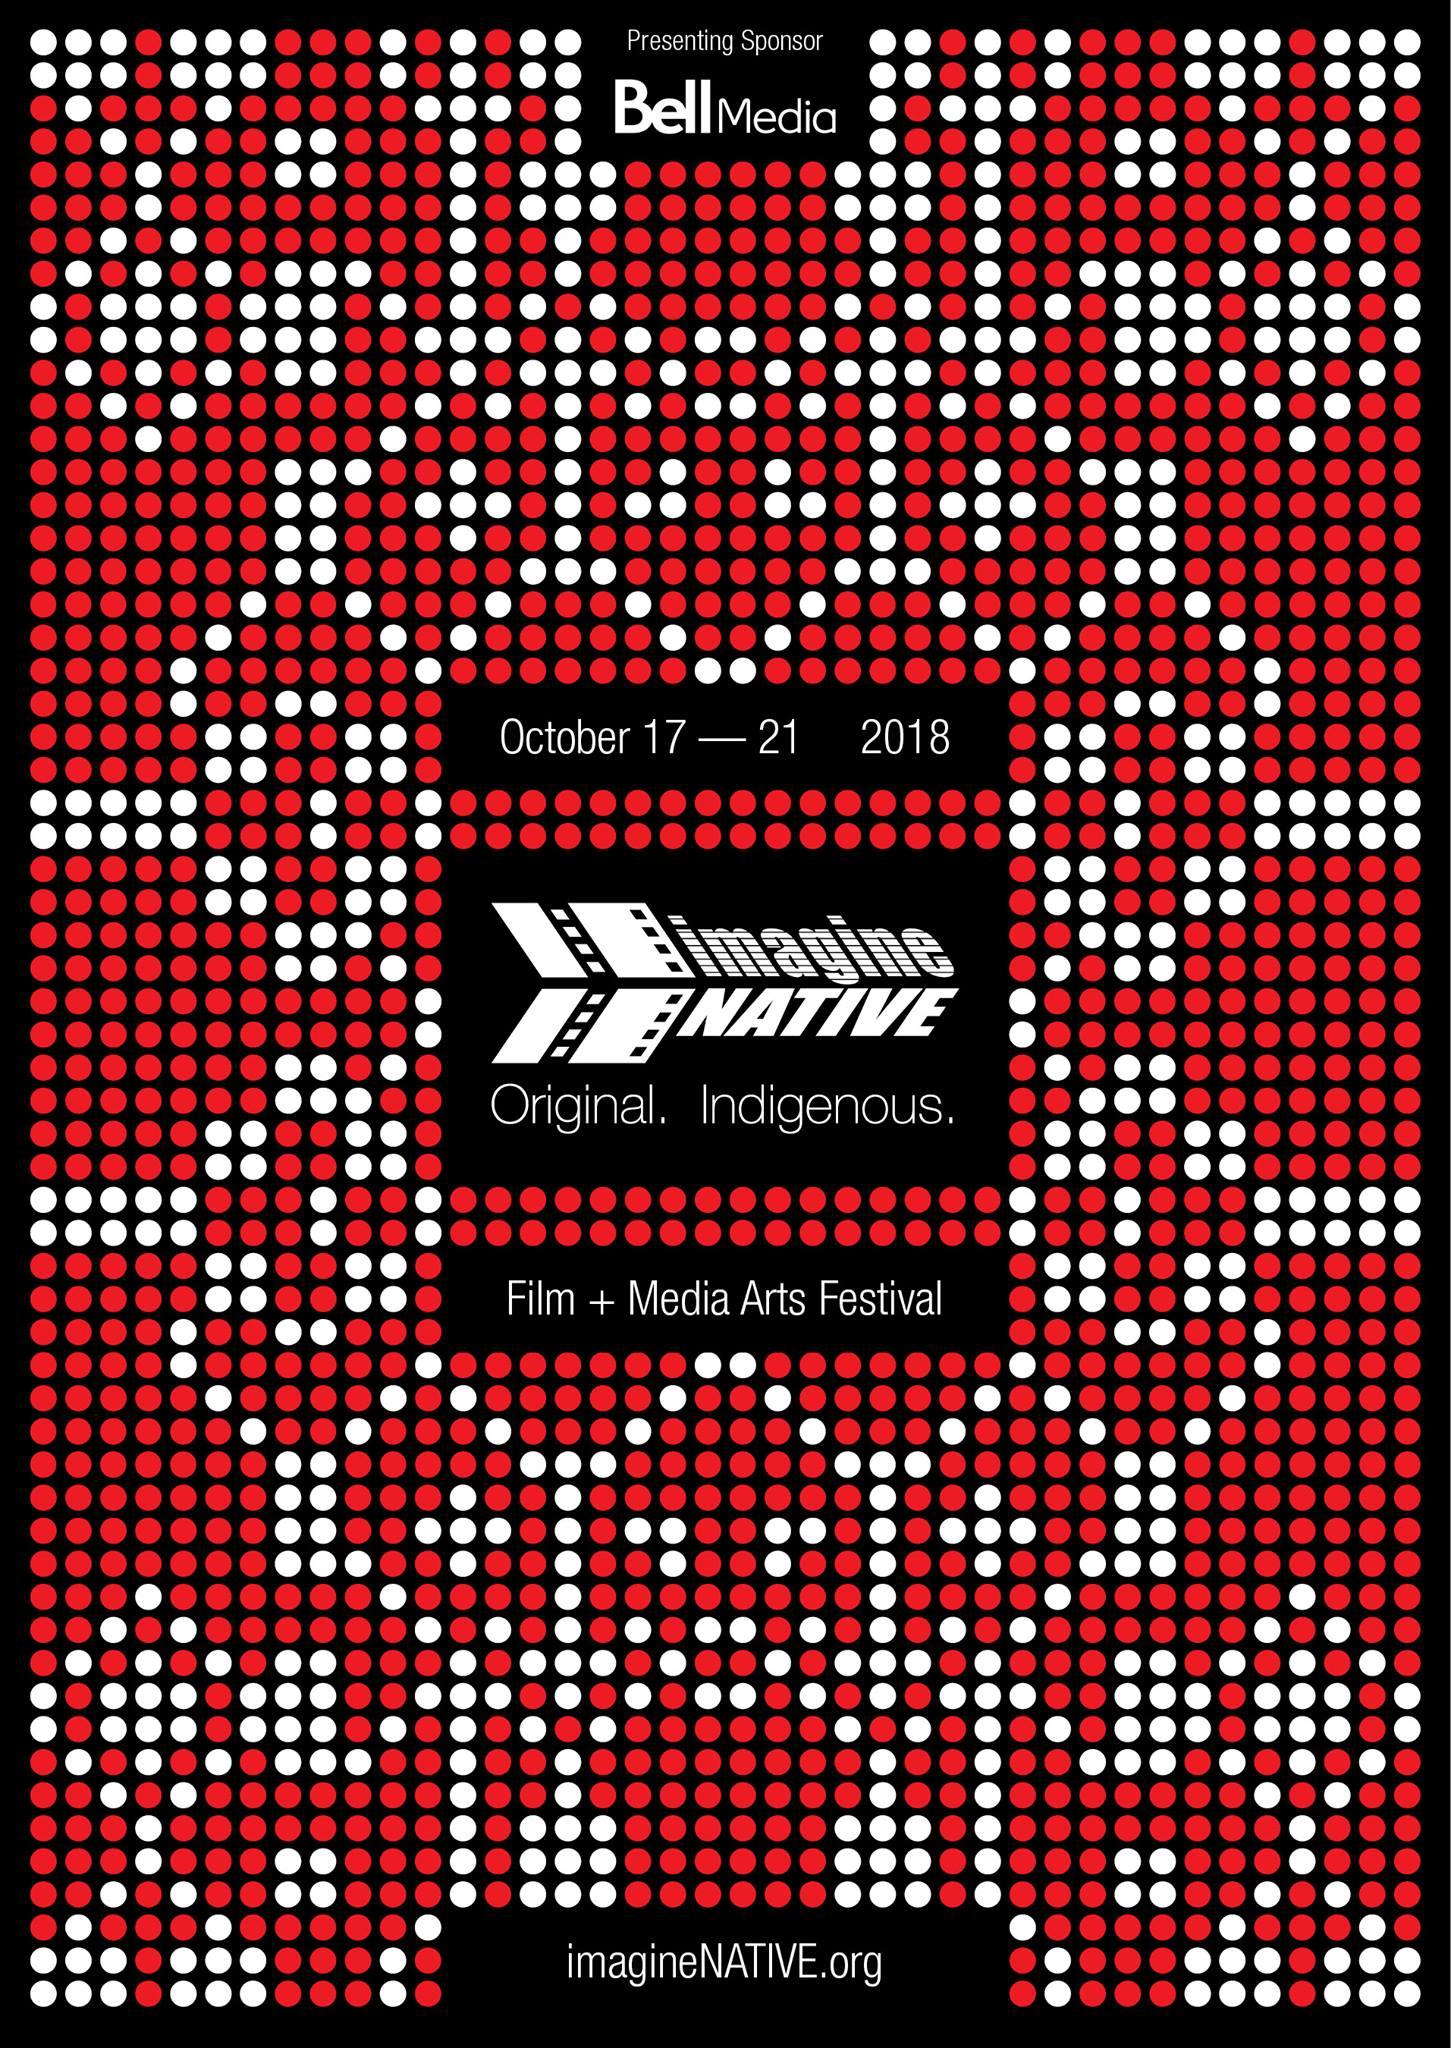 imagineNATIVE Film + Media Arts Festival